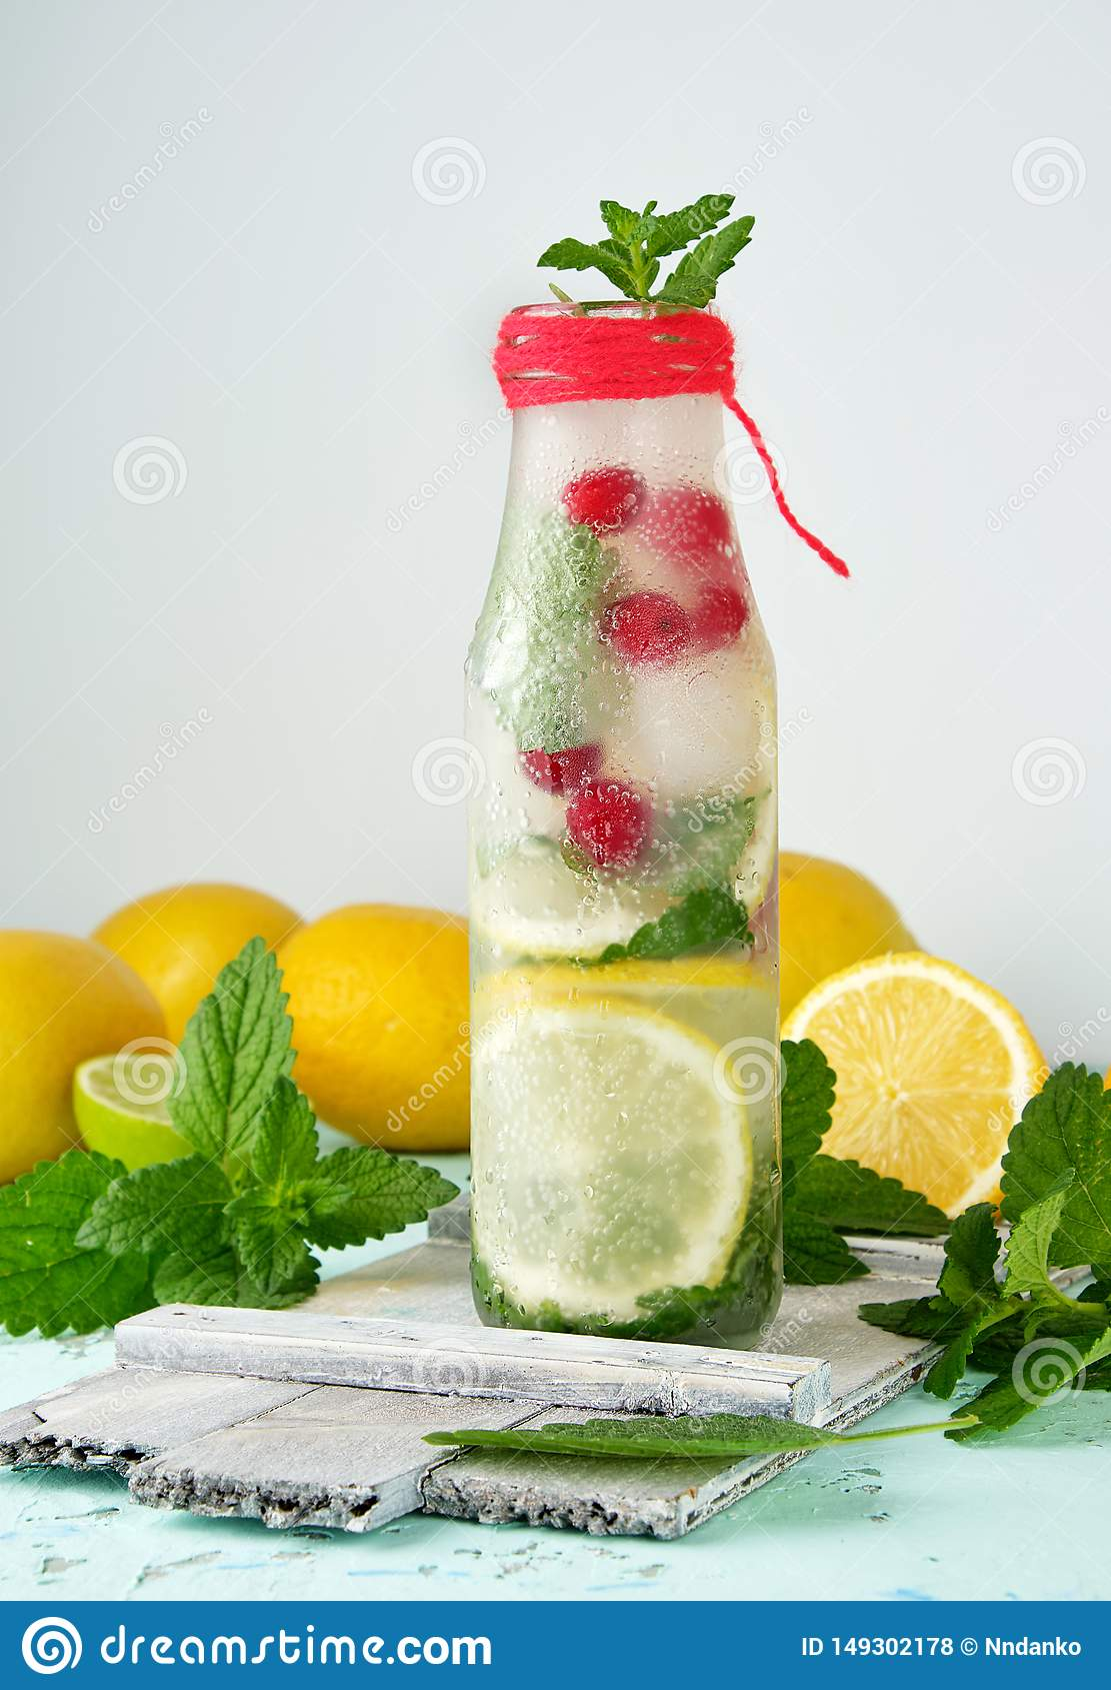 summer refreshing drink lemonade with lemons, mint leaves, lime in a glass bottle